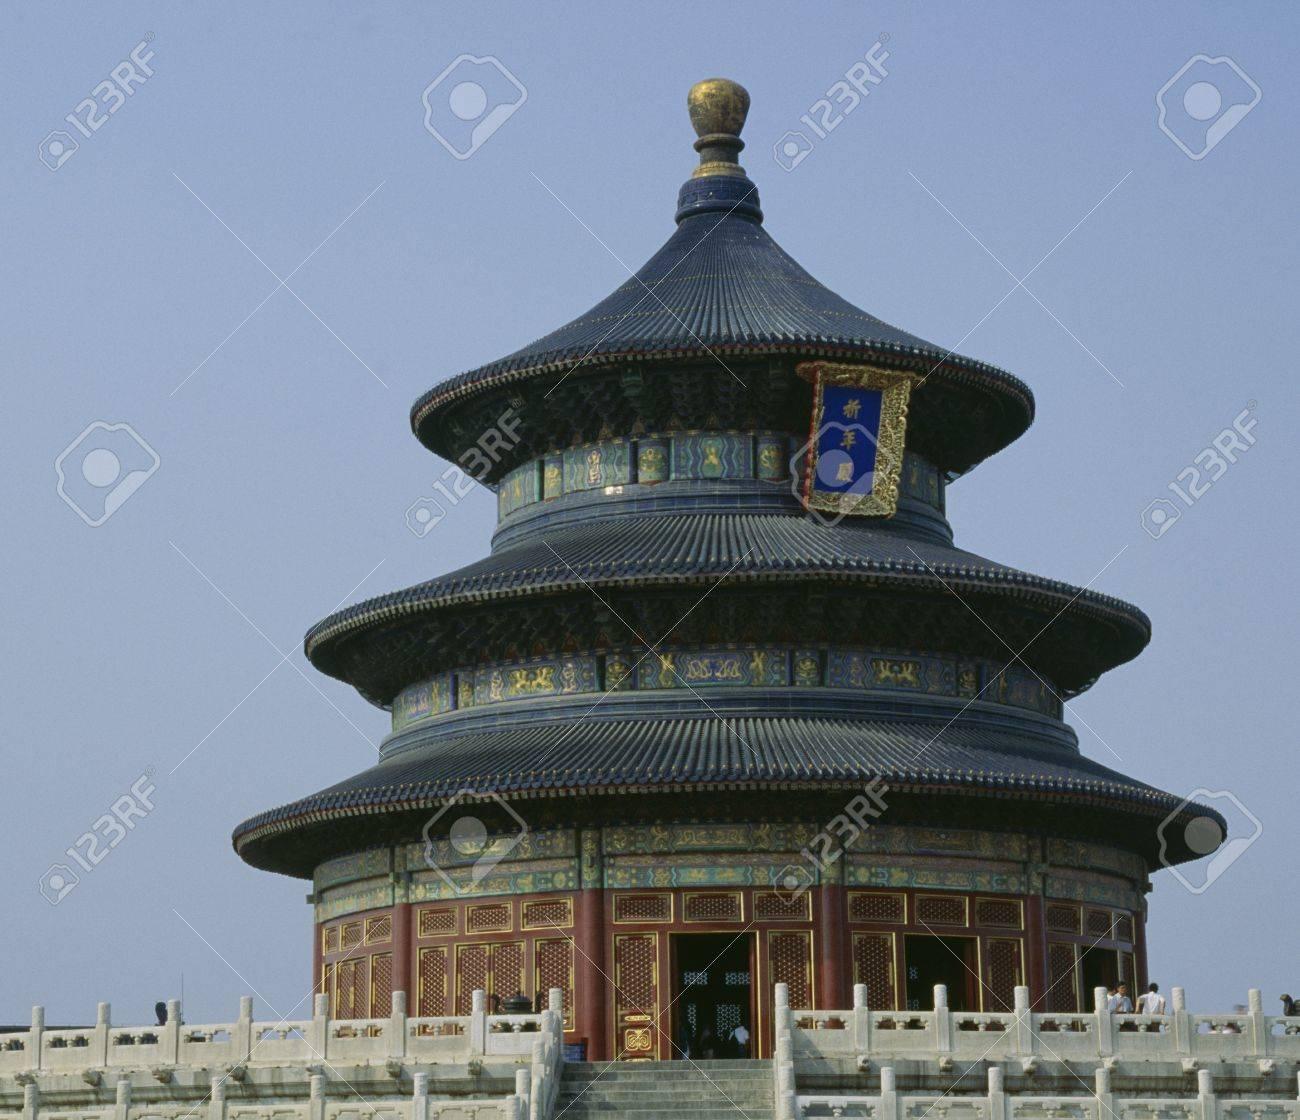 Temple of Heaven Stock Photo - 7559485